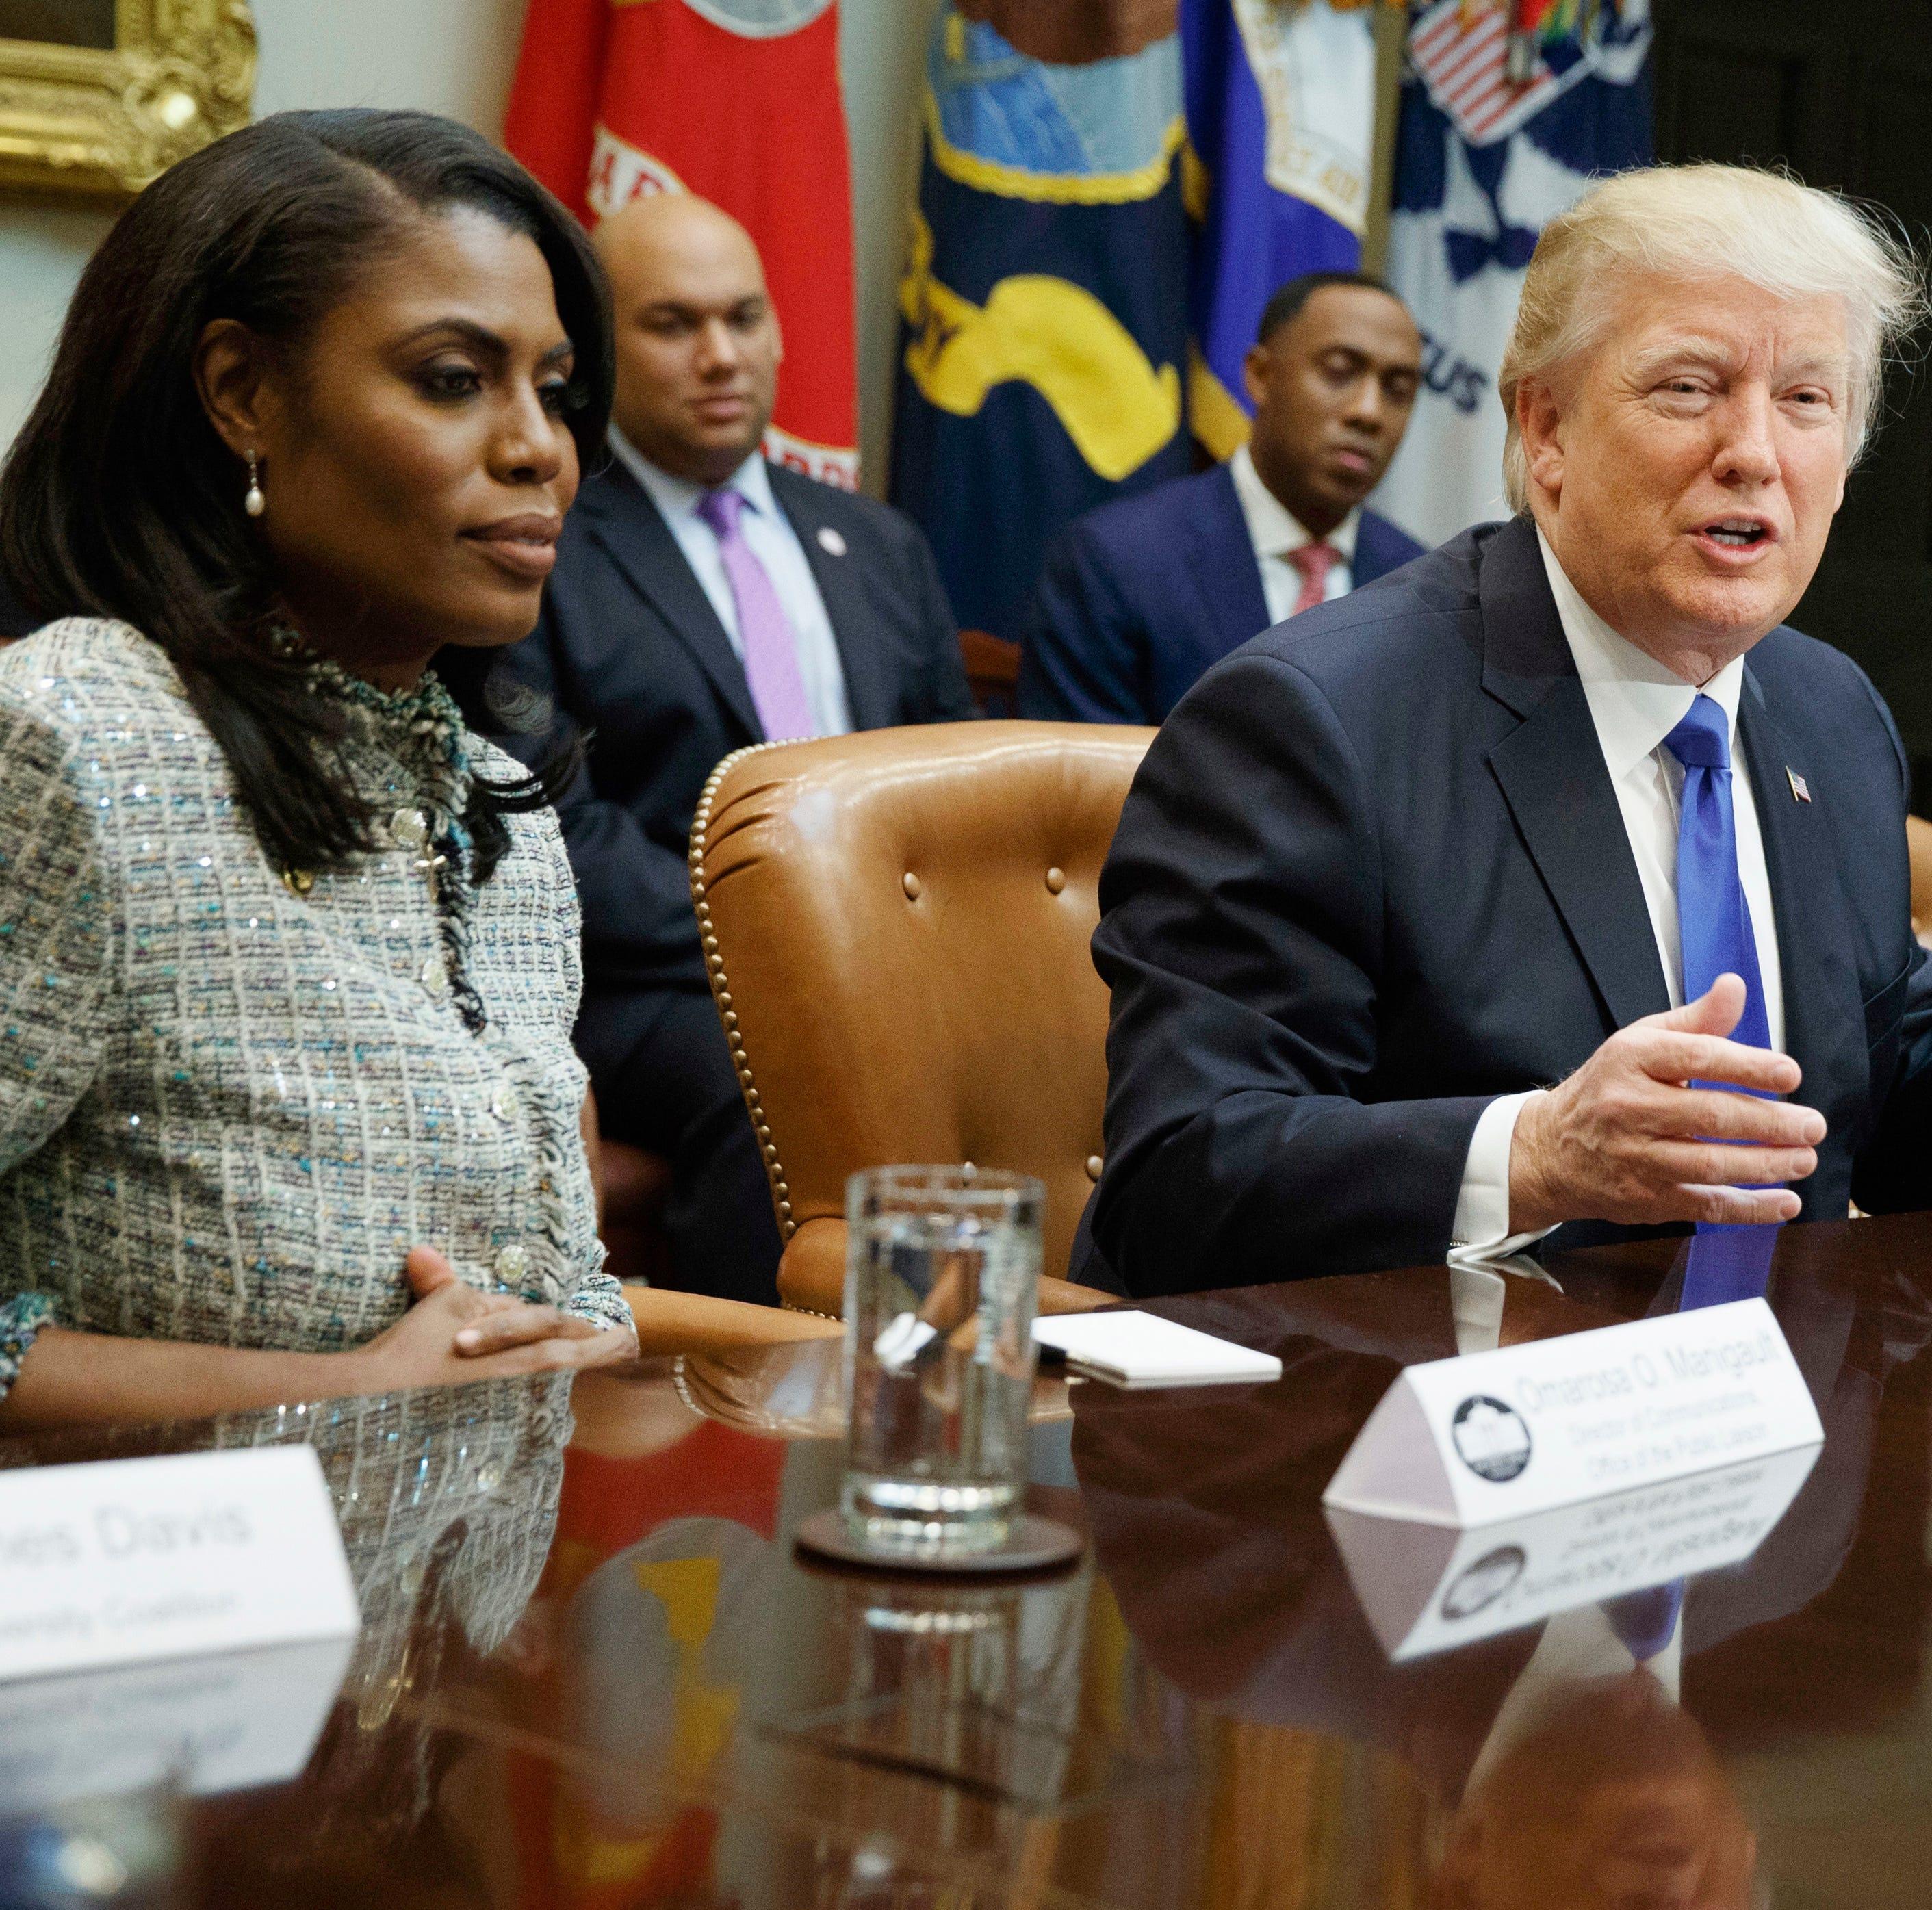 Donald Trump calls former aide Omarosa a 'dog,' triggering outrage